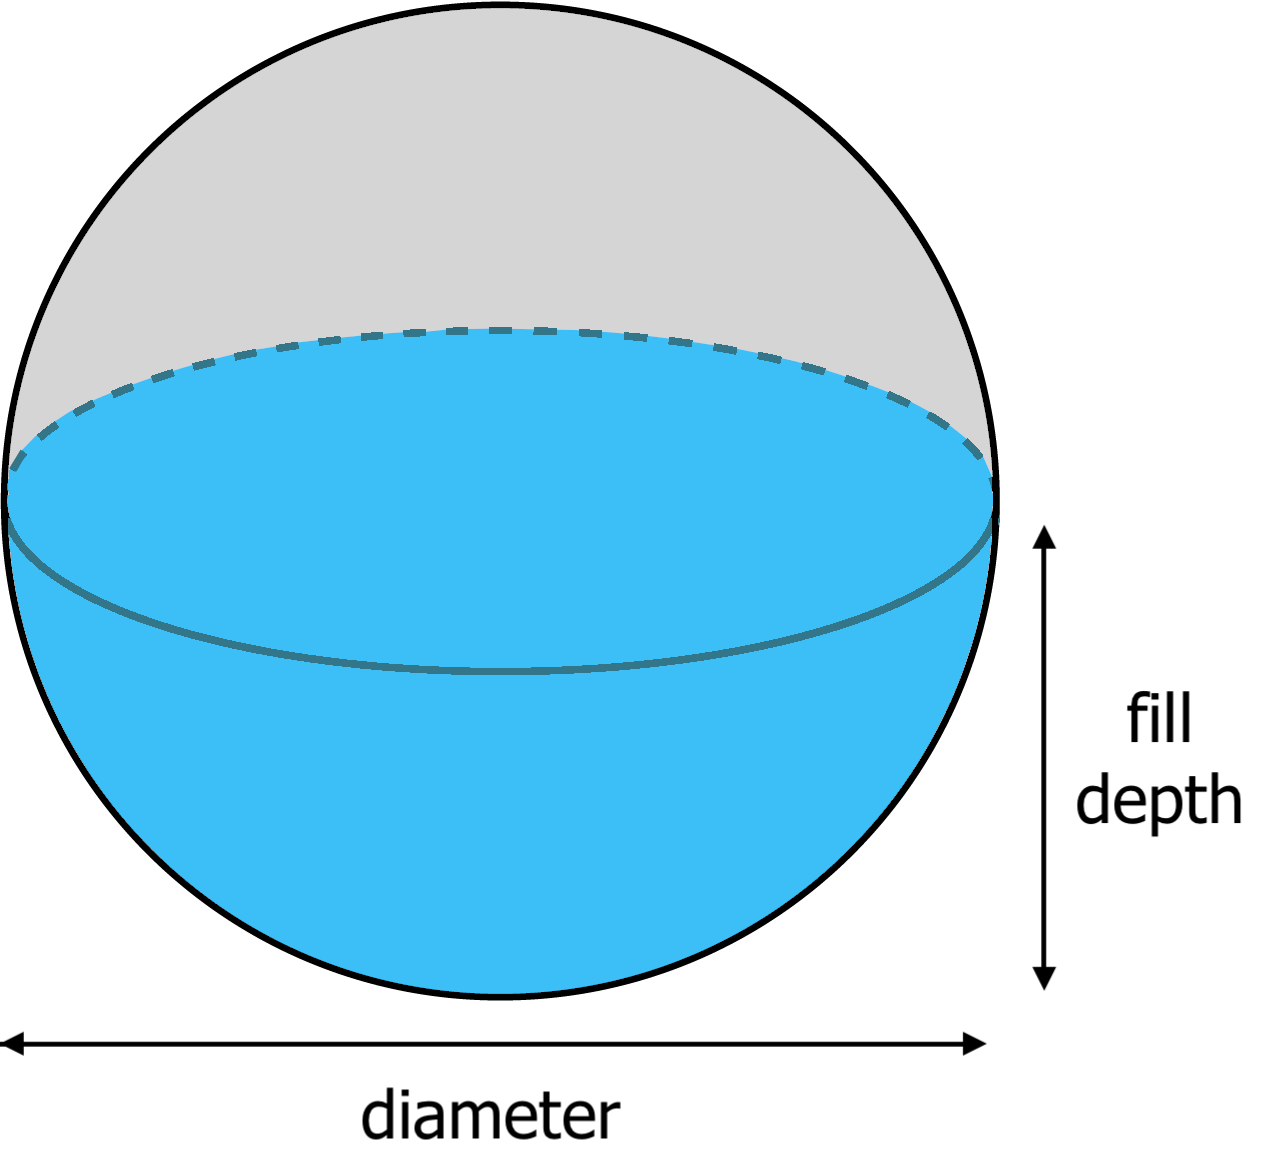 sphere tank diagram showing diameter and fill depth dimensions